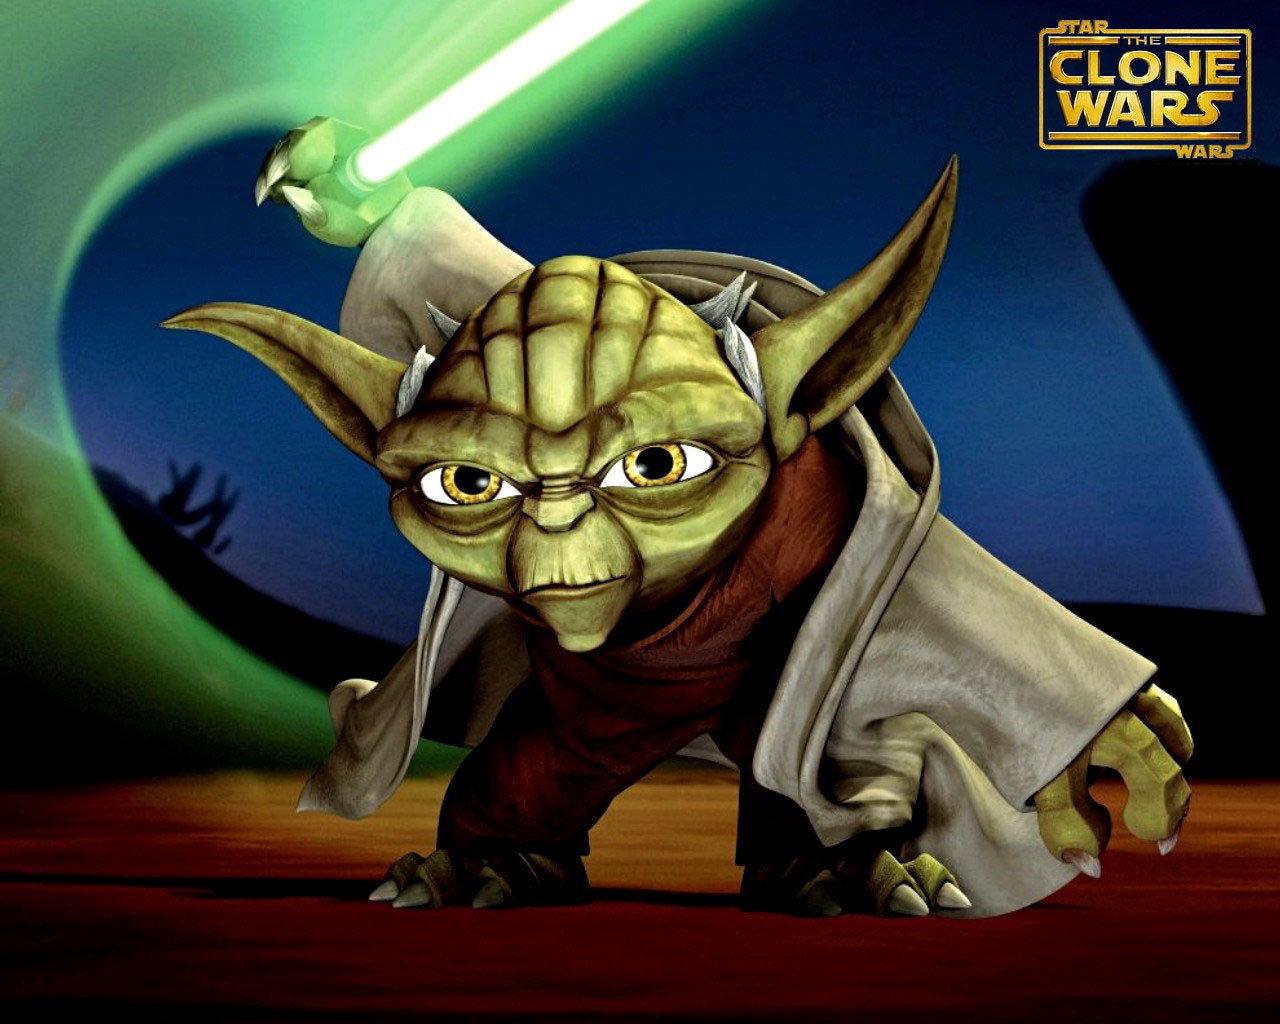 star wars the clone wars background hd 1280x1024 275660